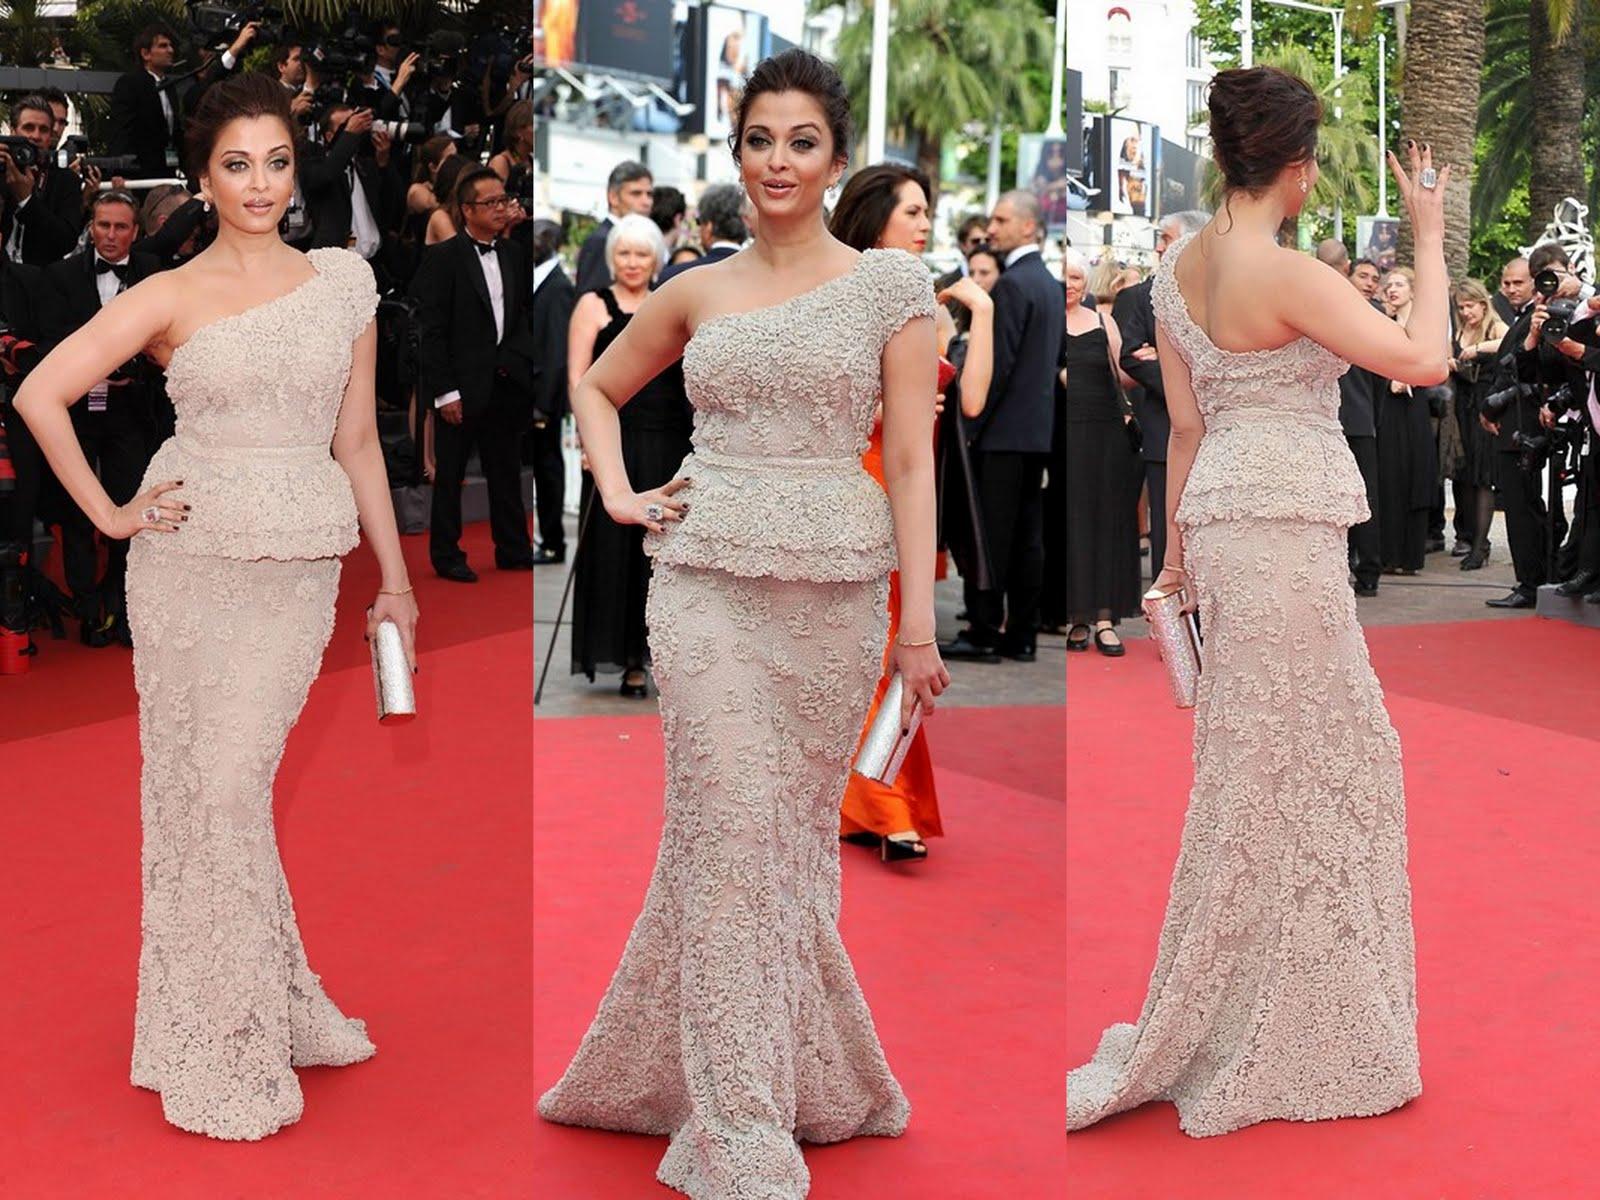 http://1.bp.blogspot.com/-mmlVtL7Rg3Y/TgGSiuTYmRI/AAAAAAAADDM/MVmPb0dDEco/s1600/Aishwarya-64th-Cannes-film-festival.jpg